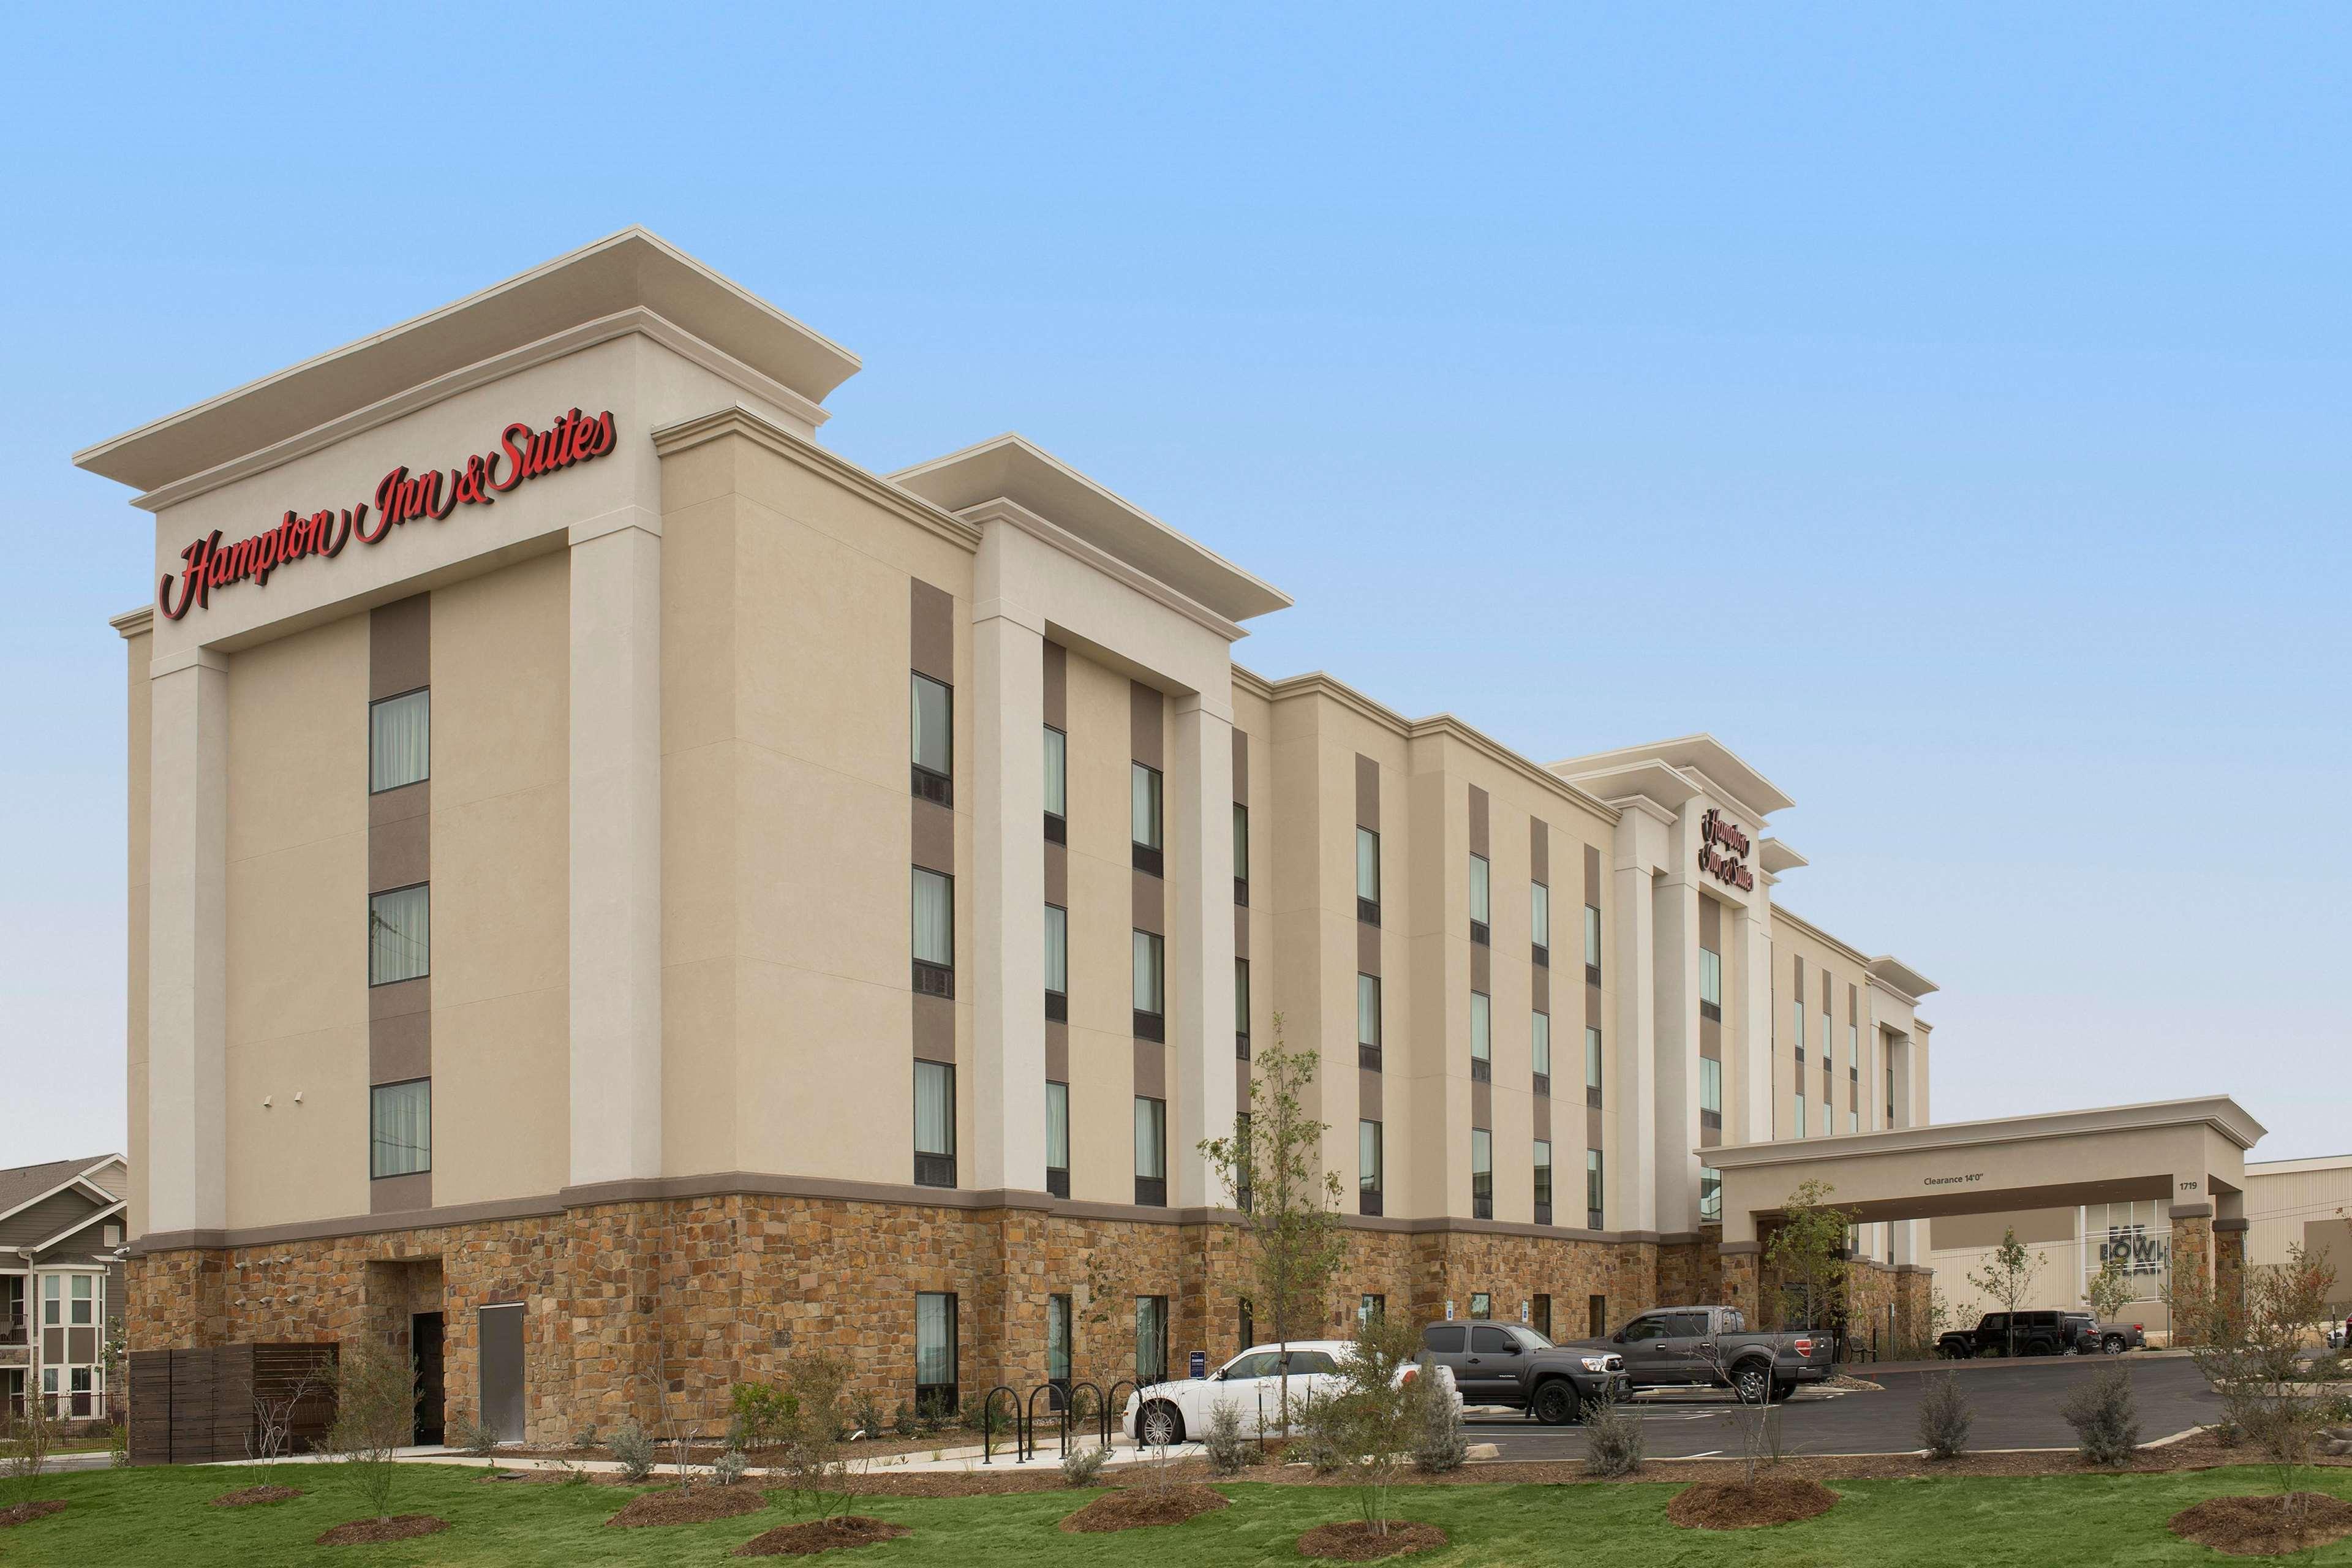 Hampton Inn Amp Suites San Antonio Lackland Afb Seaworld